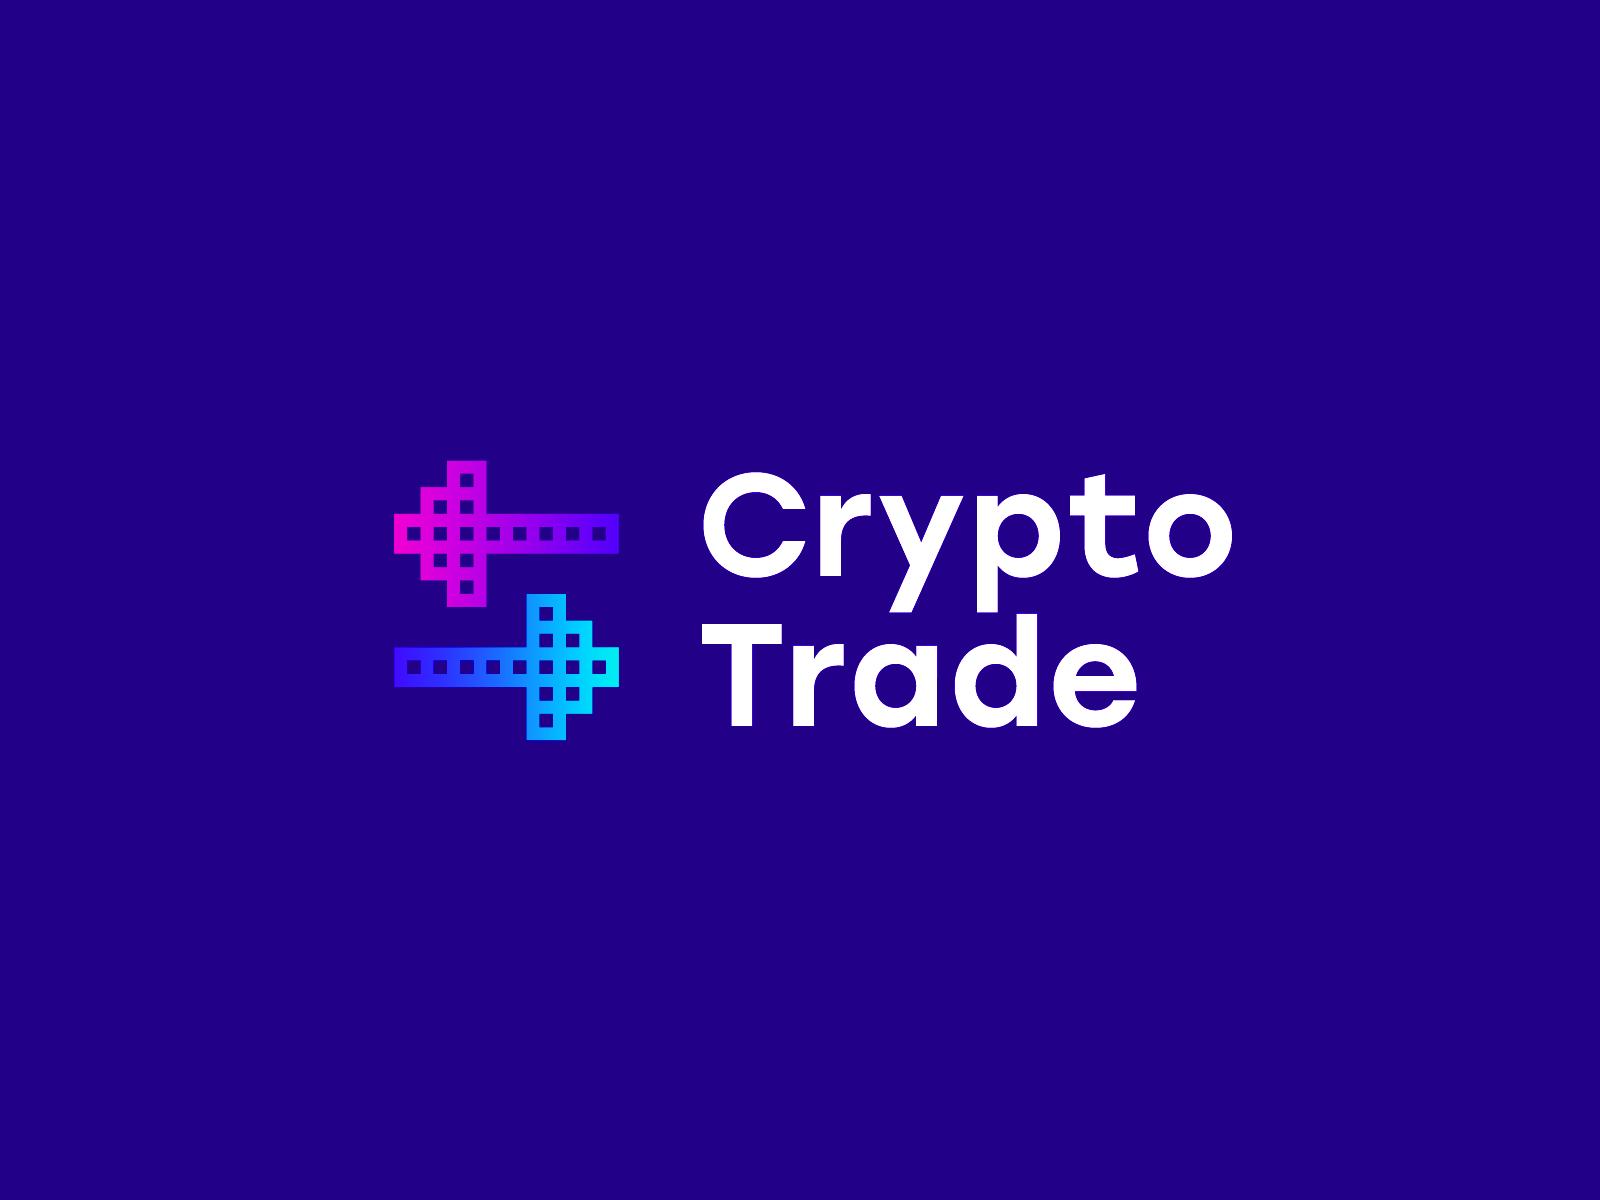 autofill toe cryptocurrenting trading)